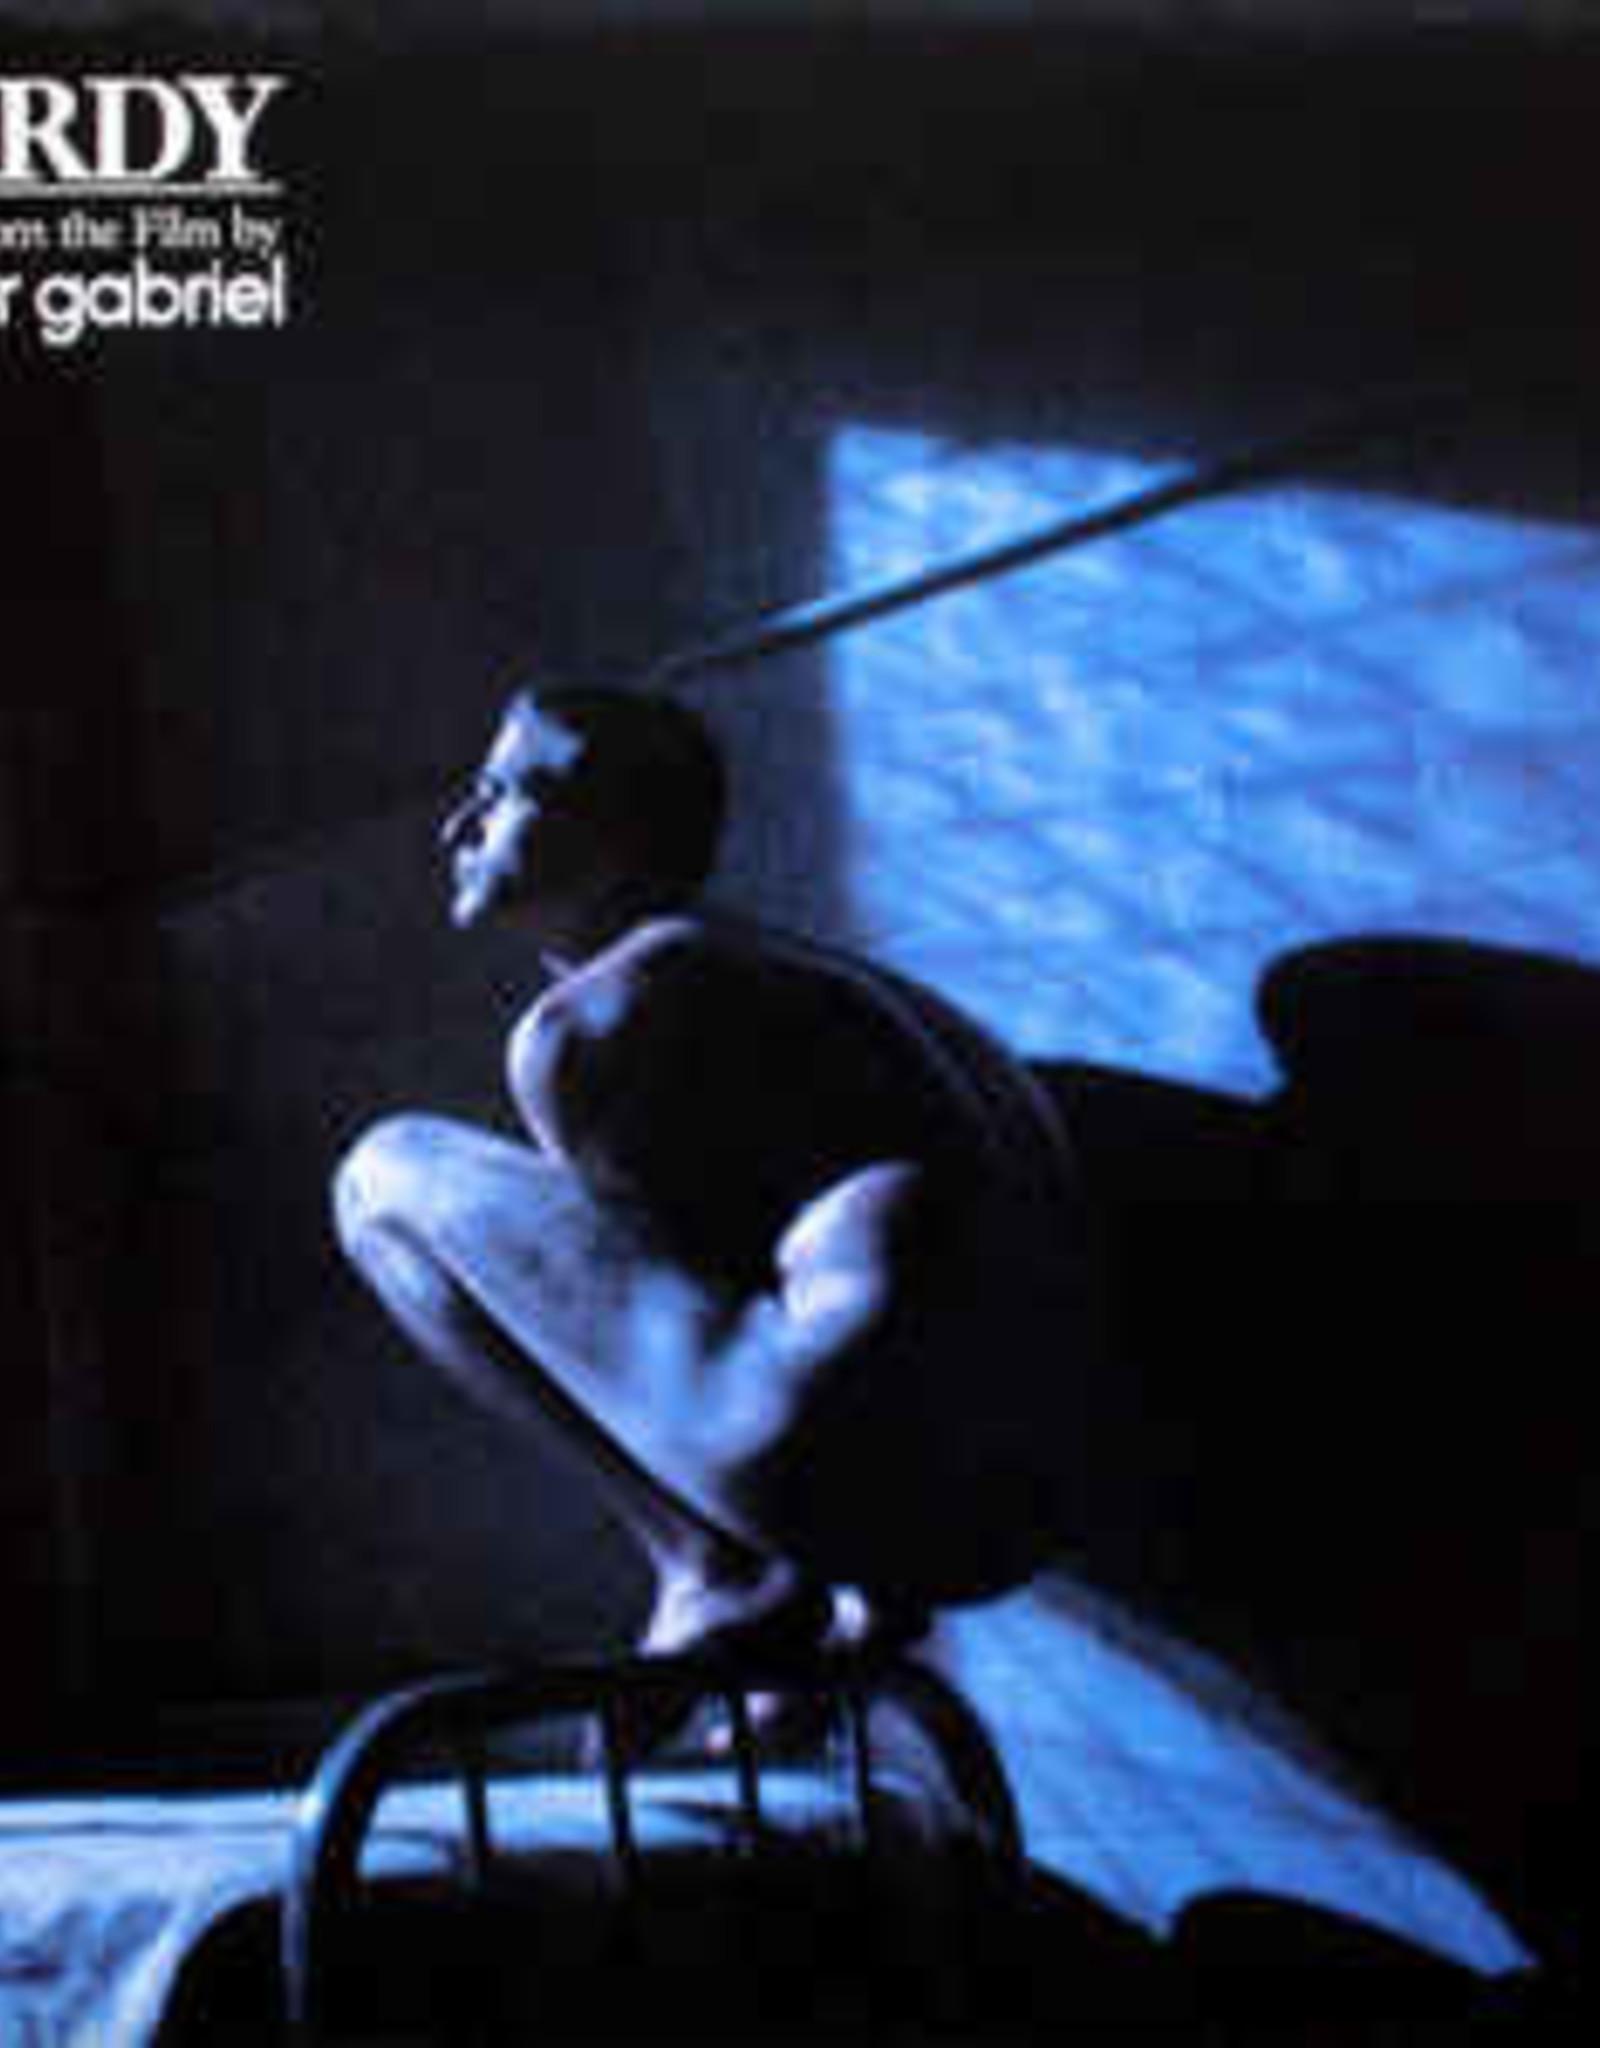 Peter Gabriel - Birdy (2Lp 45 Rpm Half Speed Remaster) (Limited Edition)